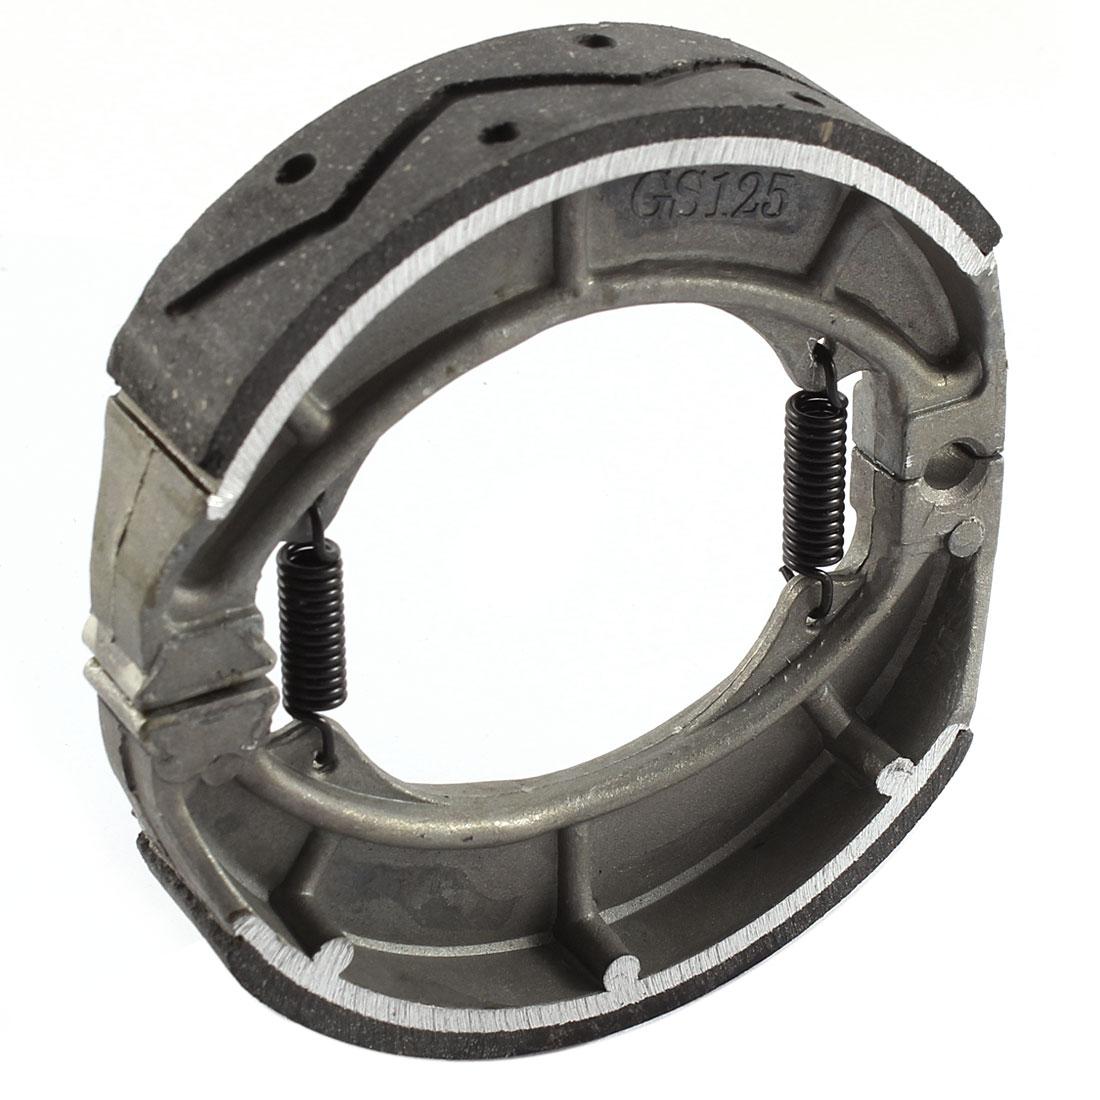 "Unique Bargains 4.7"" Dia Metal Motorcycle Rear Pads Caliper Drum Brake Shoes for GS-125"